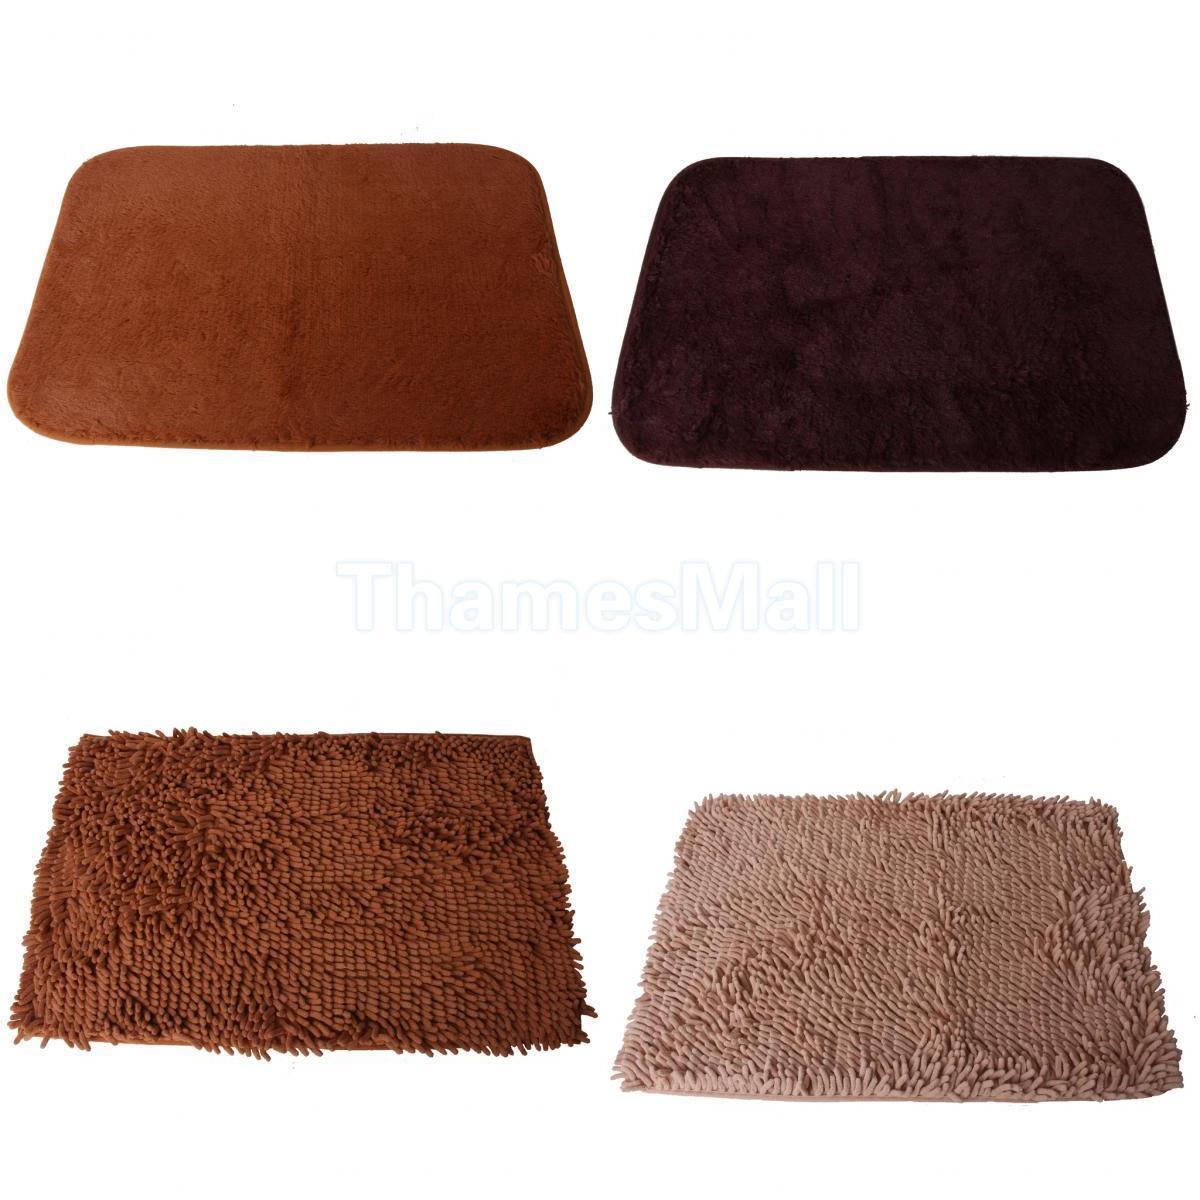 thick plush non slip absorbent floor carpet mat shaggy rug